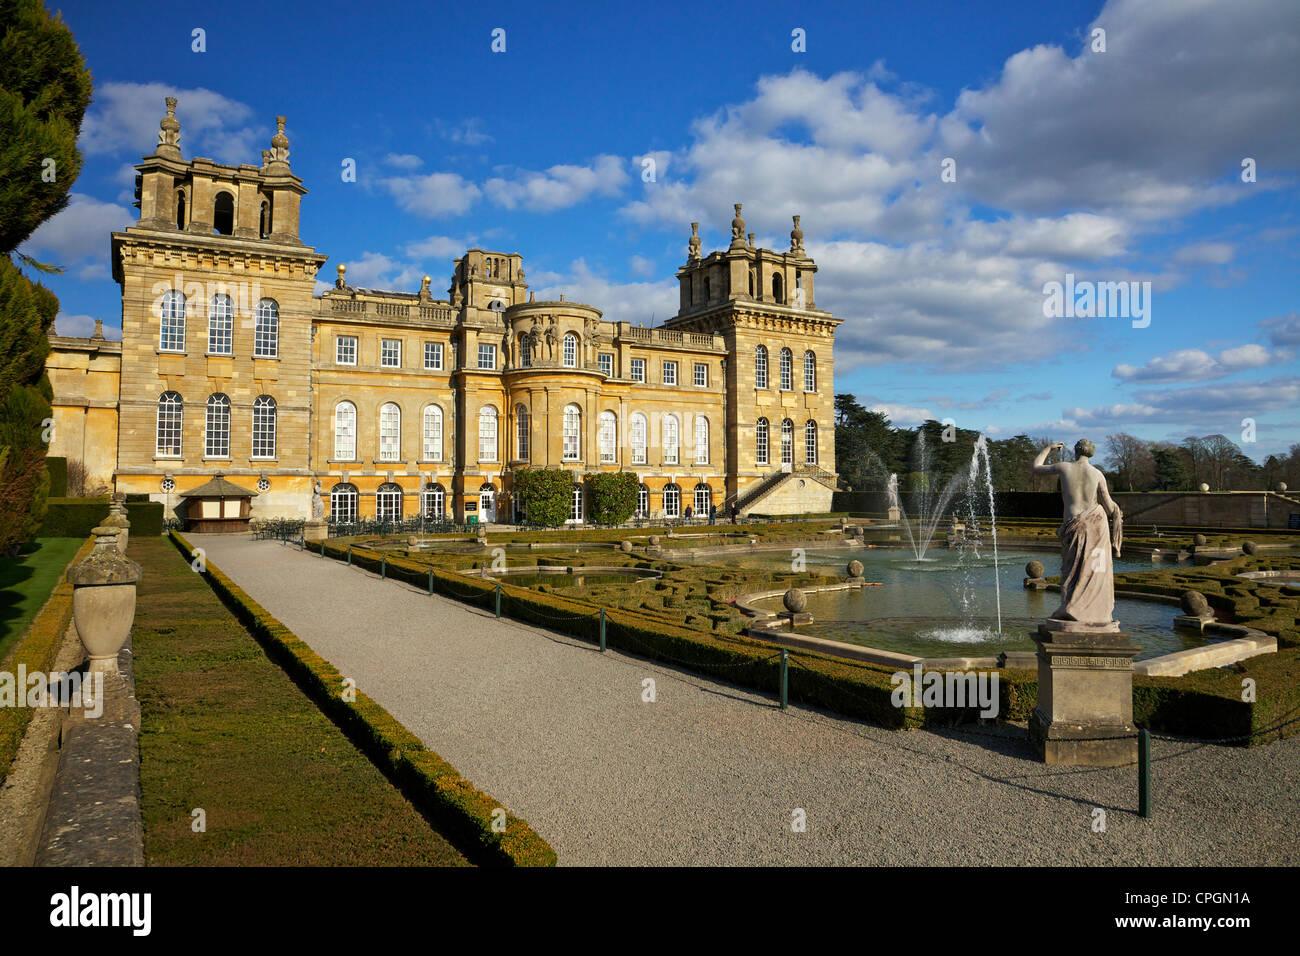 Water Gardens, Blenheim Palace, birthplace of Sir Winston Churchill, Woodstock, Oxfordshire, England, UK, United - Stock Image